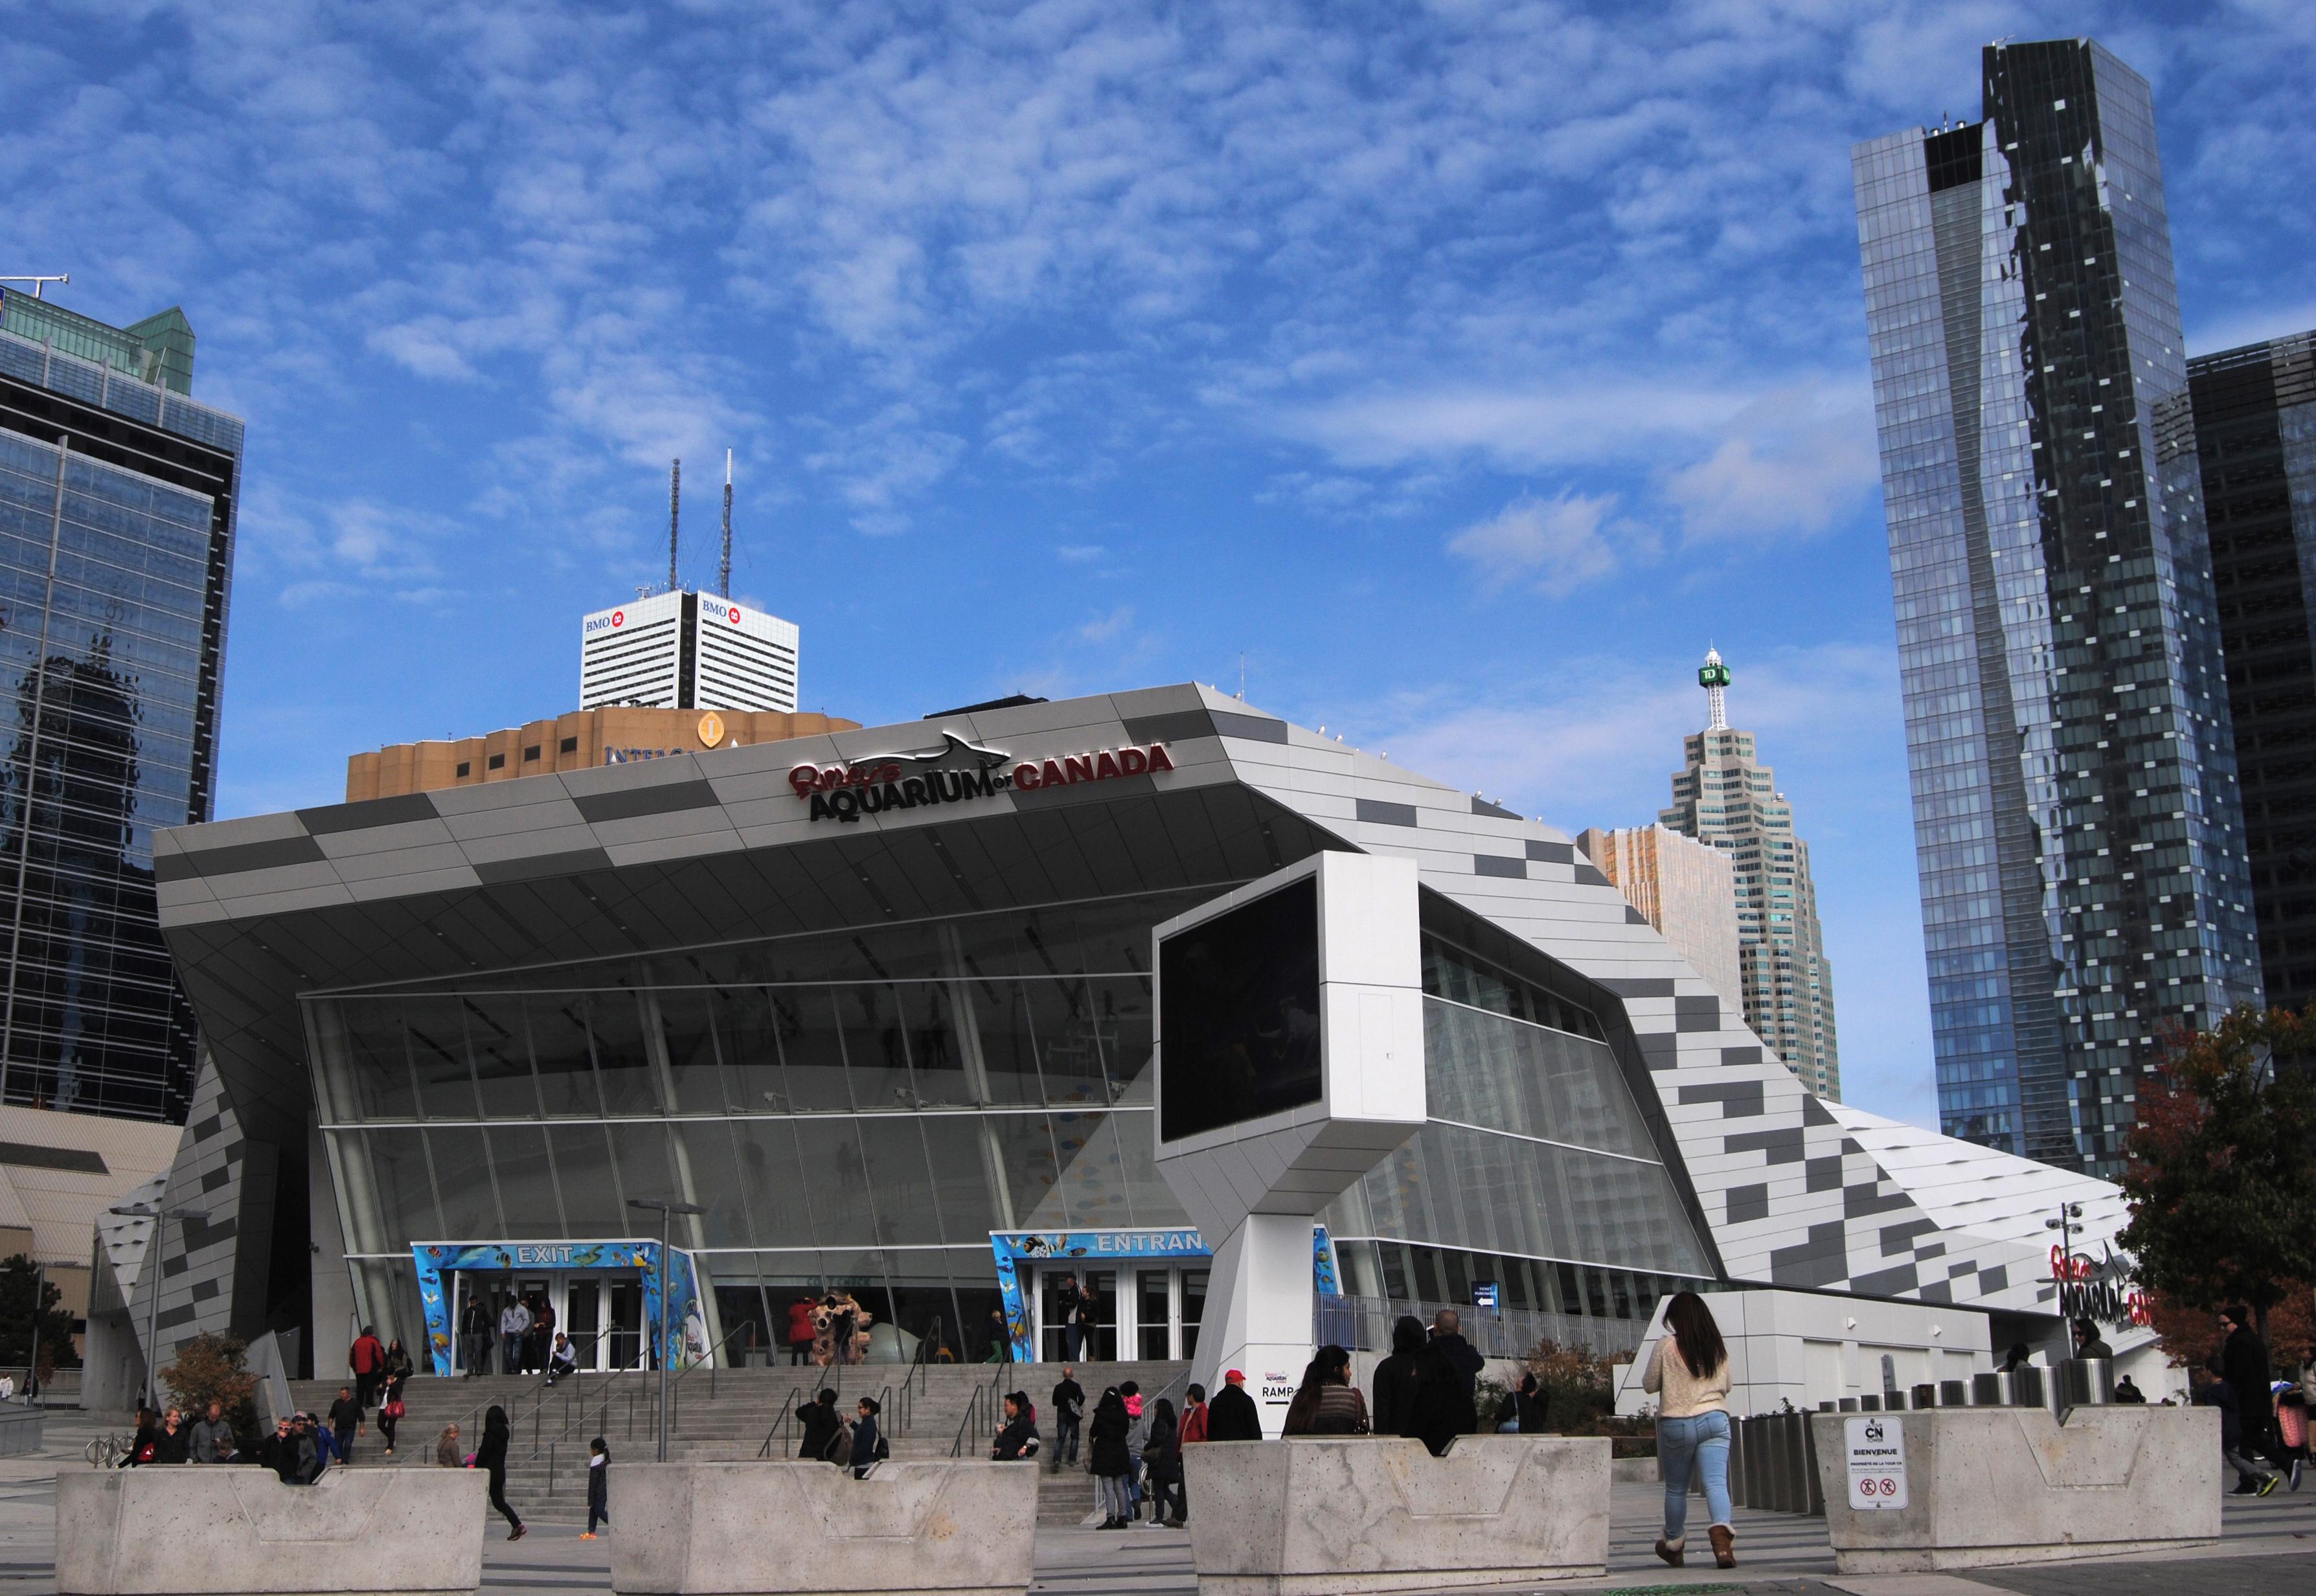 File:Ripley's Aquarium of Canada, Toronto, Ontario.jpg ...